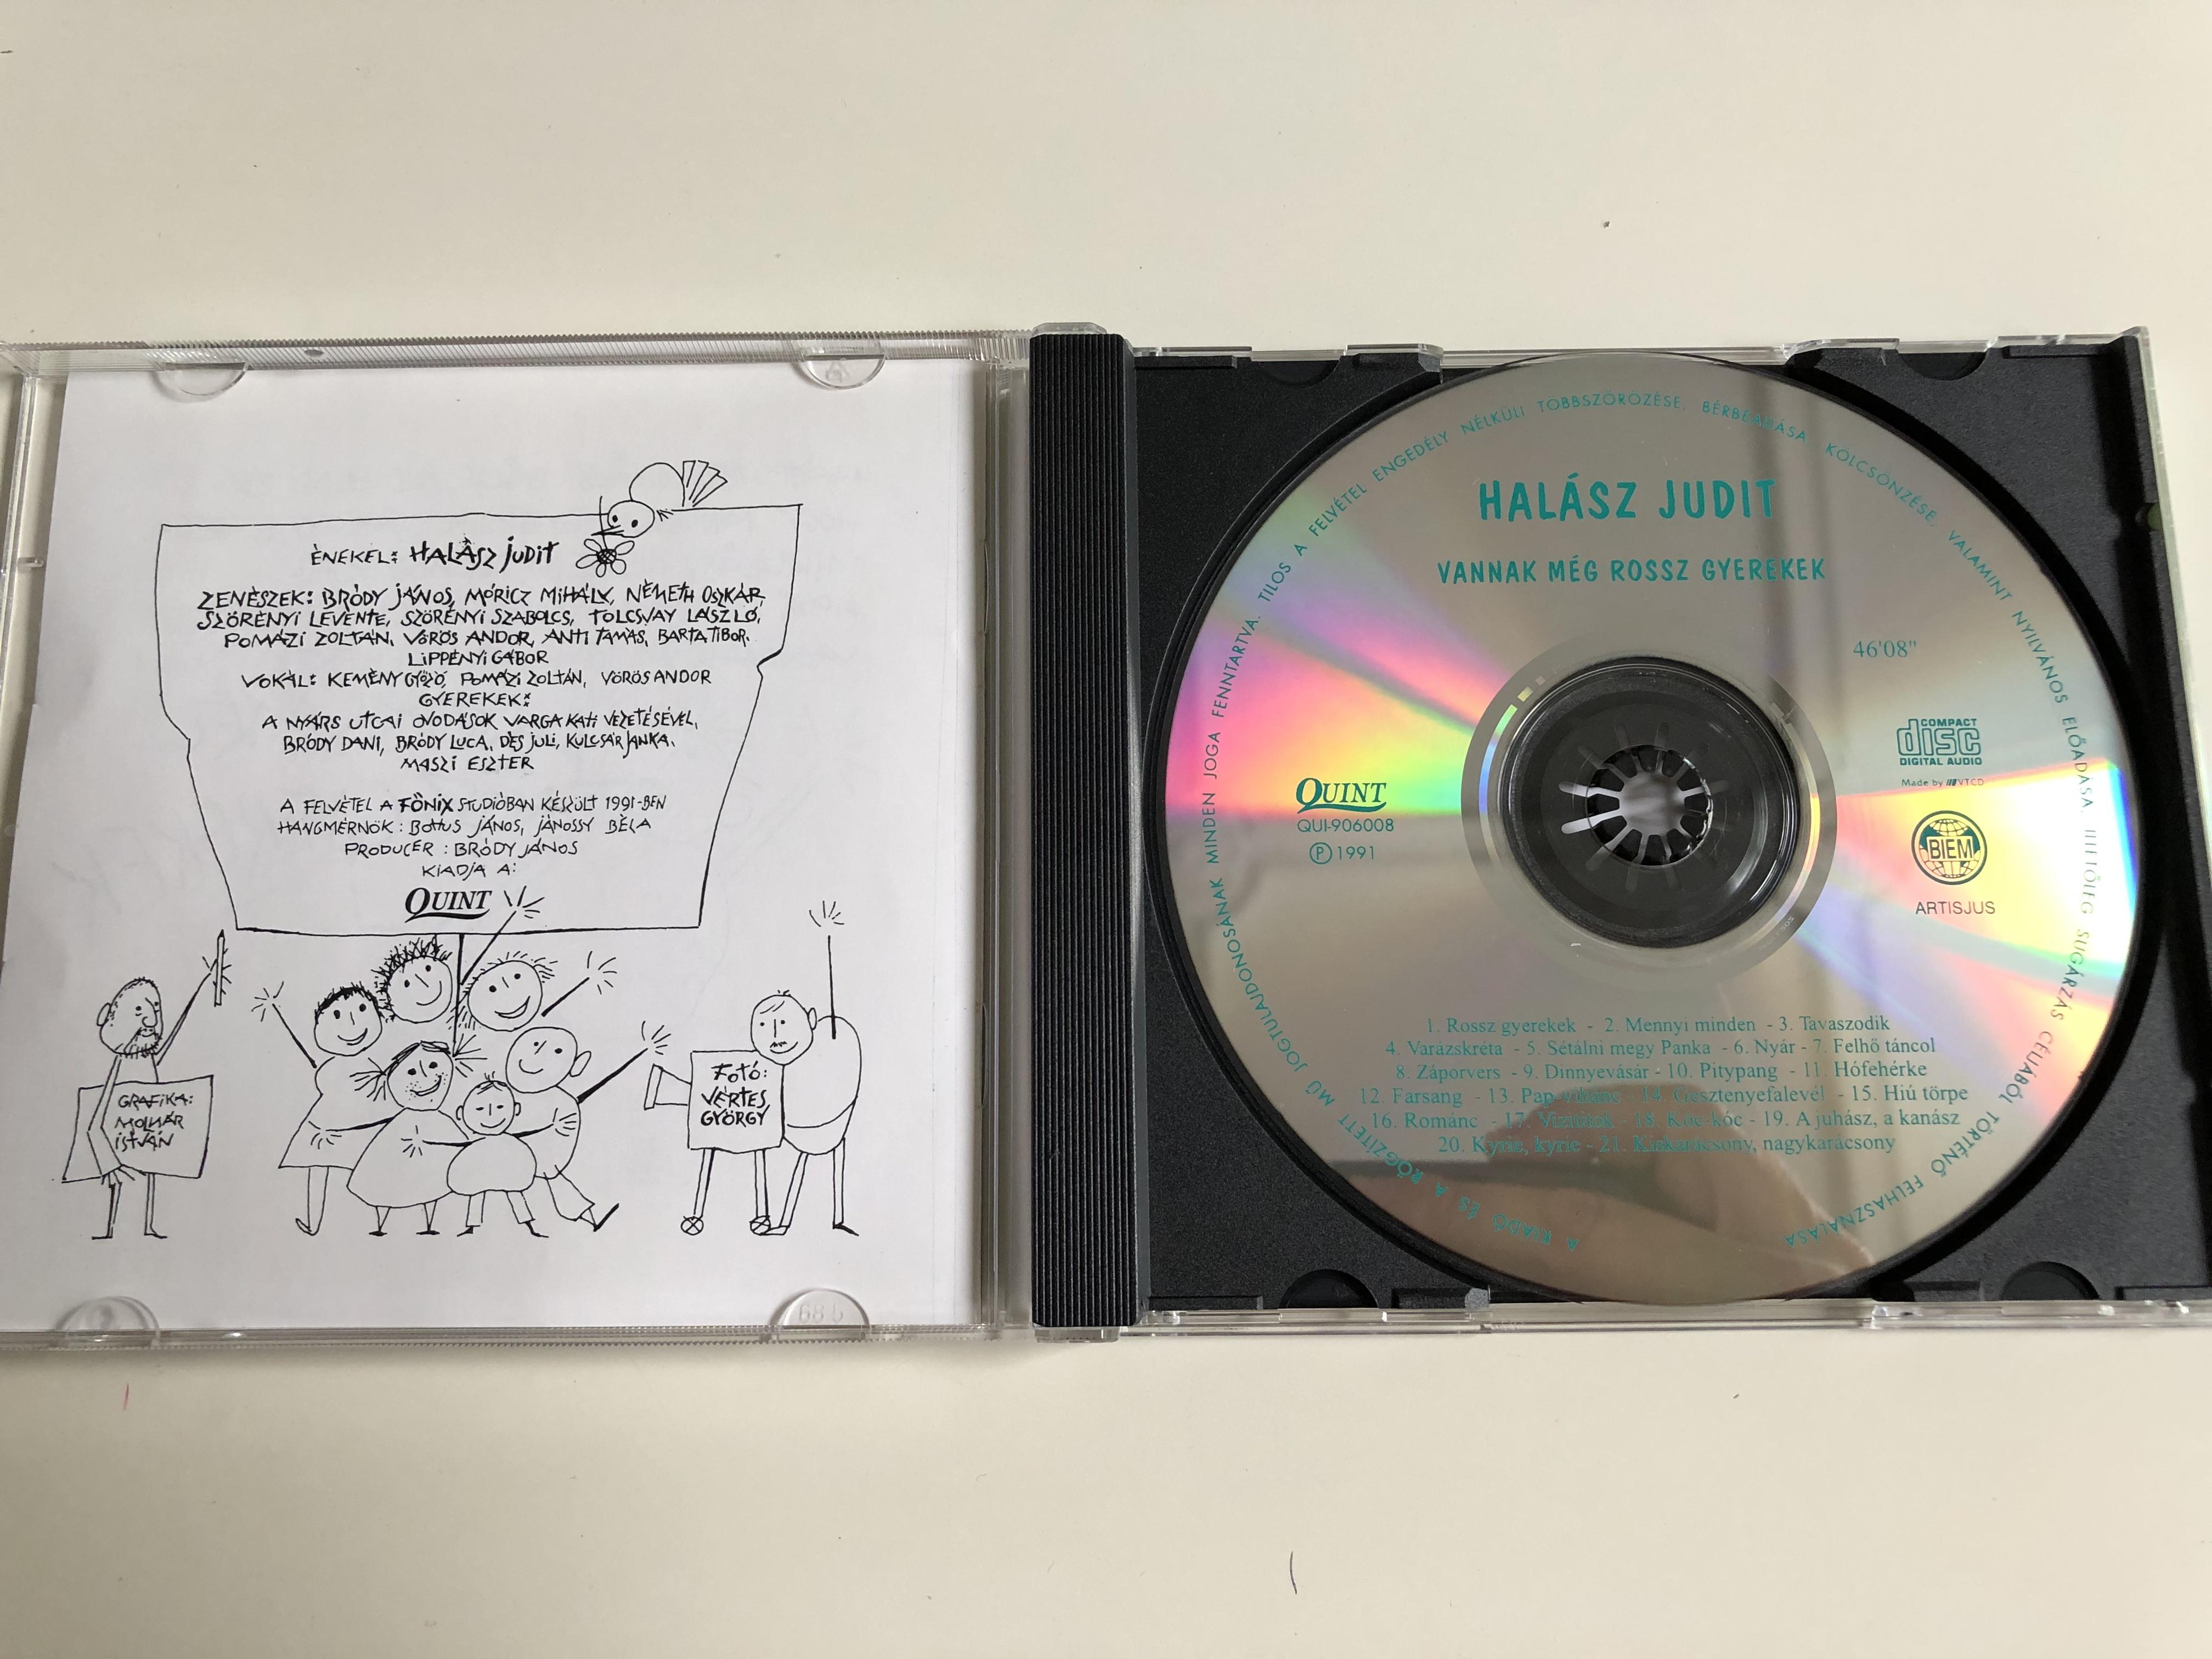 hal-sz-judit-vannak-m-g-rossz-gyerekek-tavaszodik-var-zskr-ta-ny-r-z-porvers-farsang-k-c-k-c-hungarian-children-s-songs-audio-cd-1991-5-.jpg